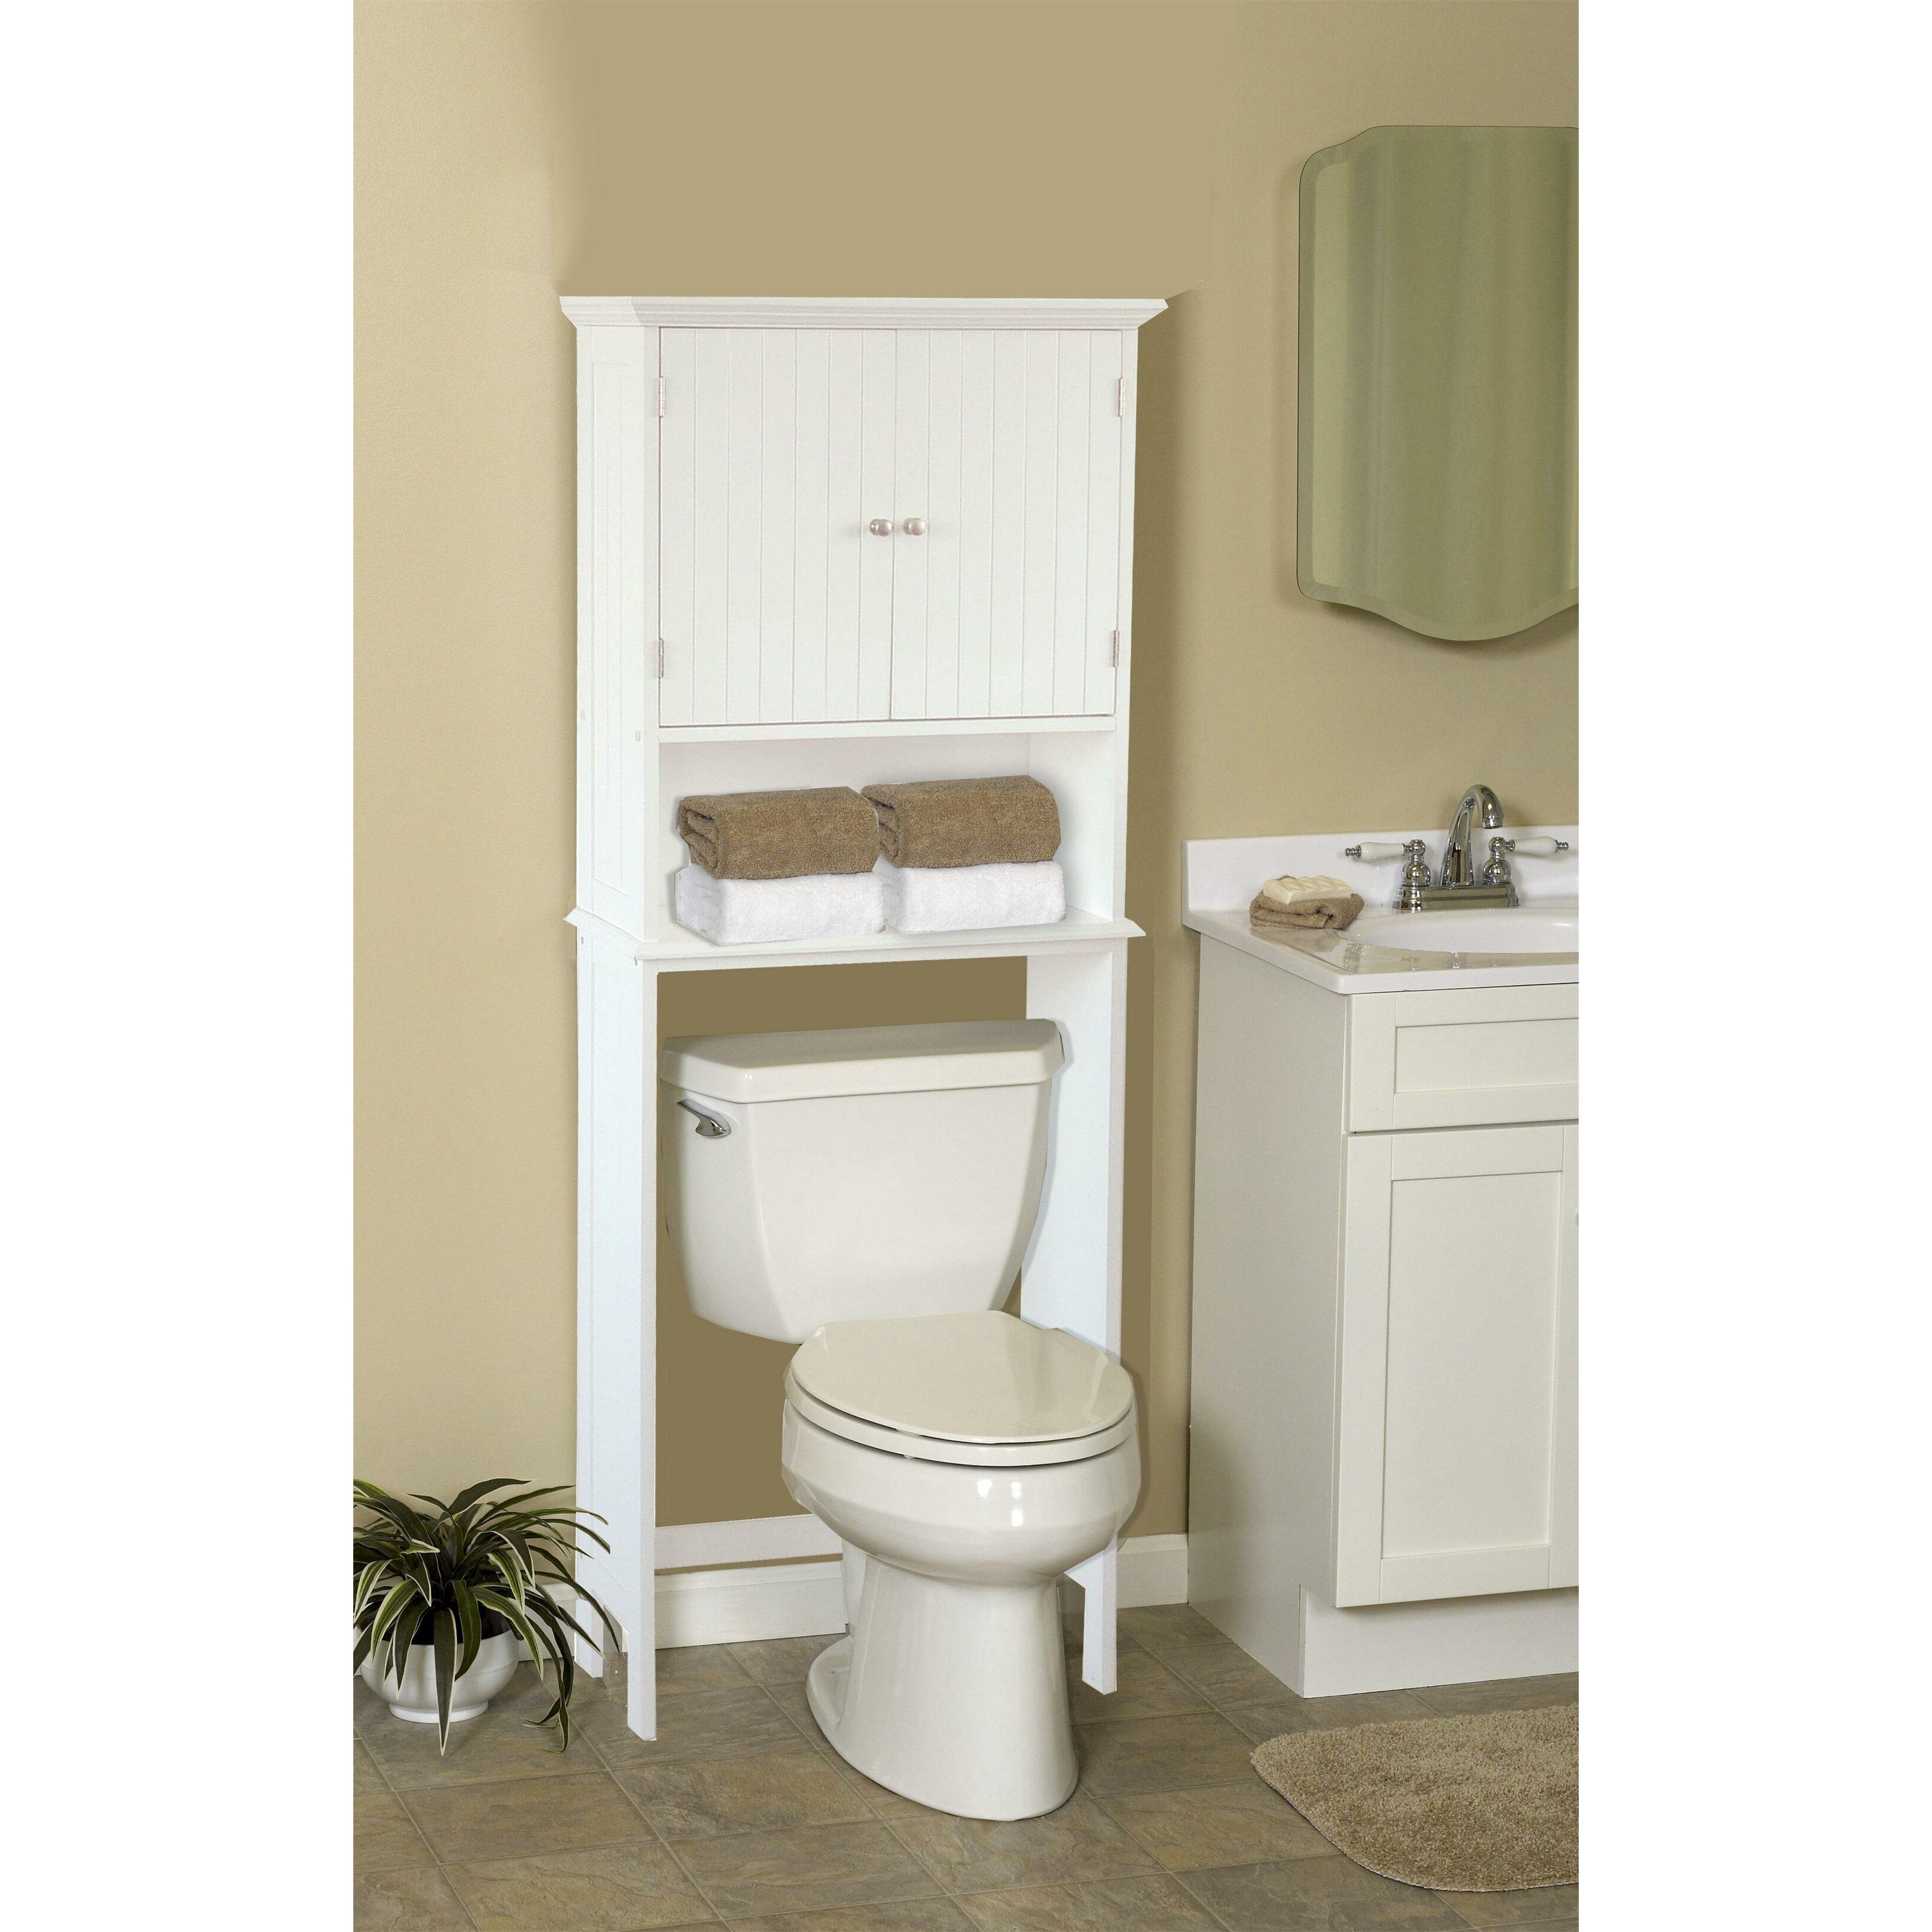 Jenlea bathroom space saver free standing cabinet reviews wayfair for Bathroom space saver cabinets